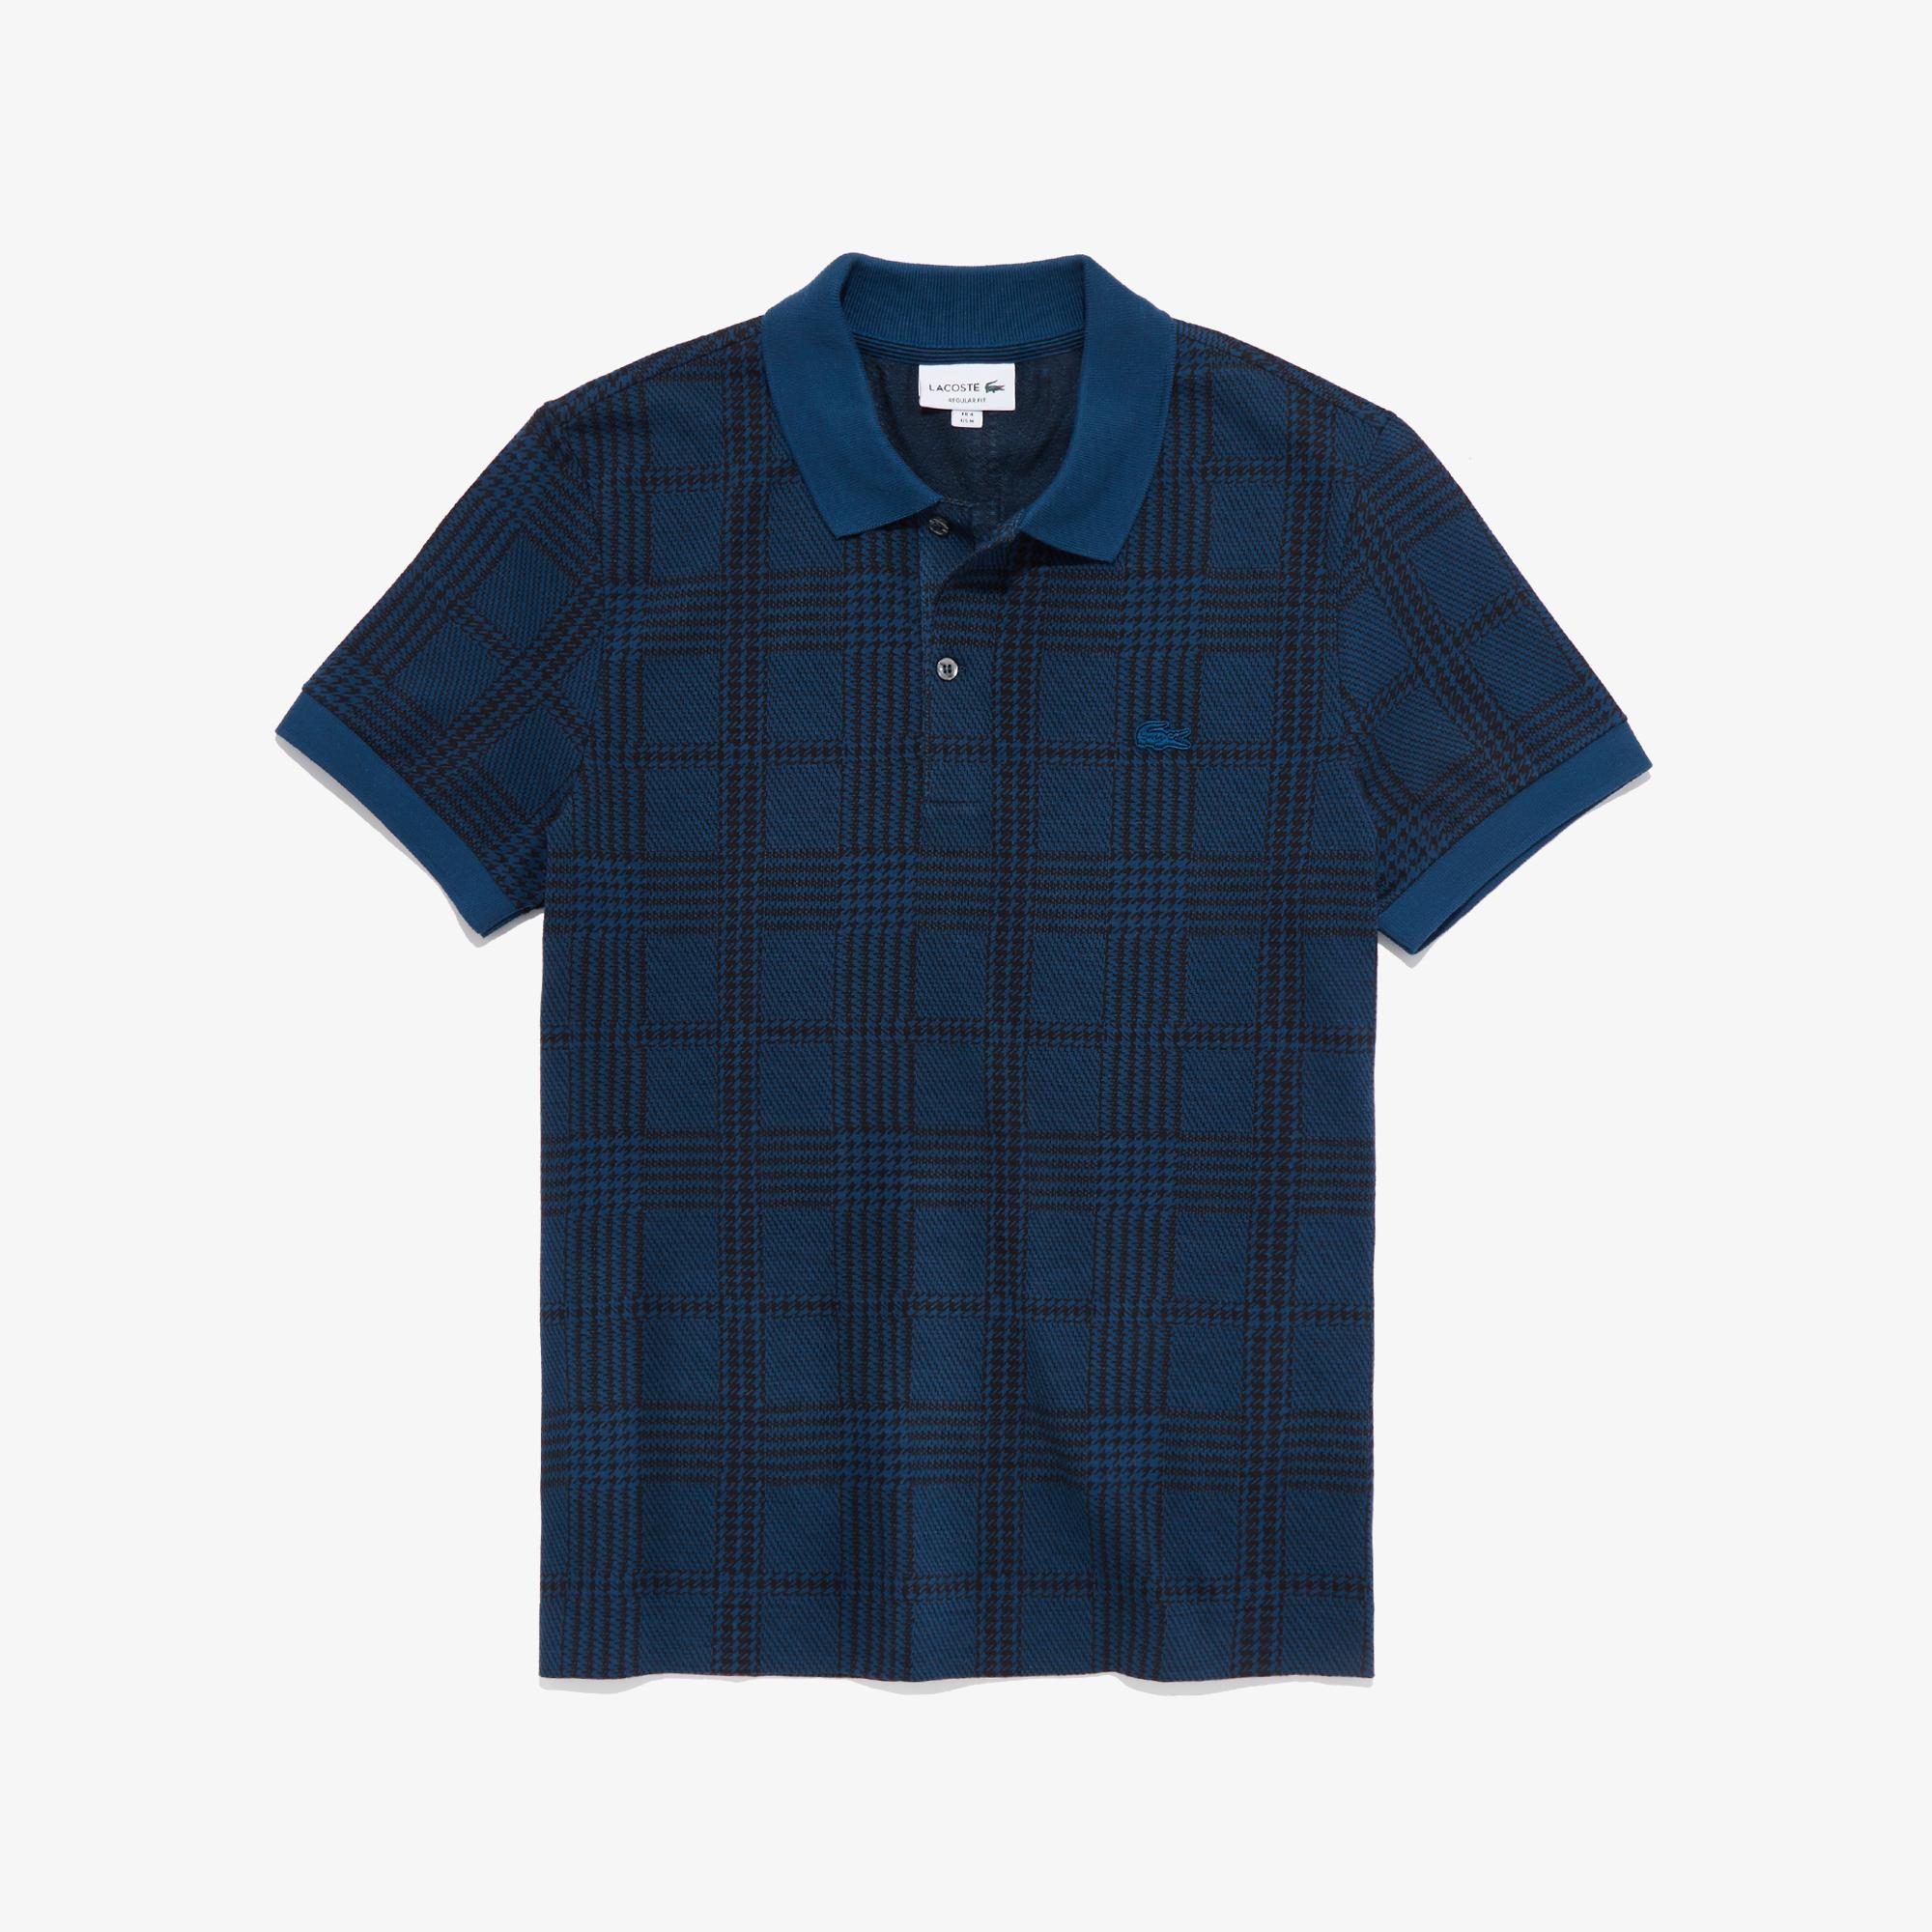 Lacoste Erkek Regular Fit Ekose Desenli Mavi Polo